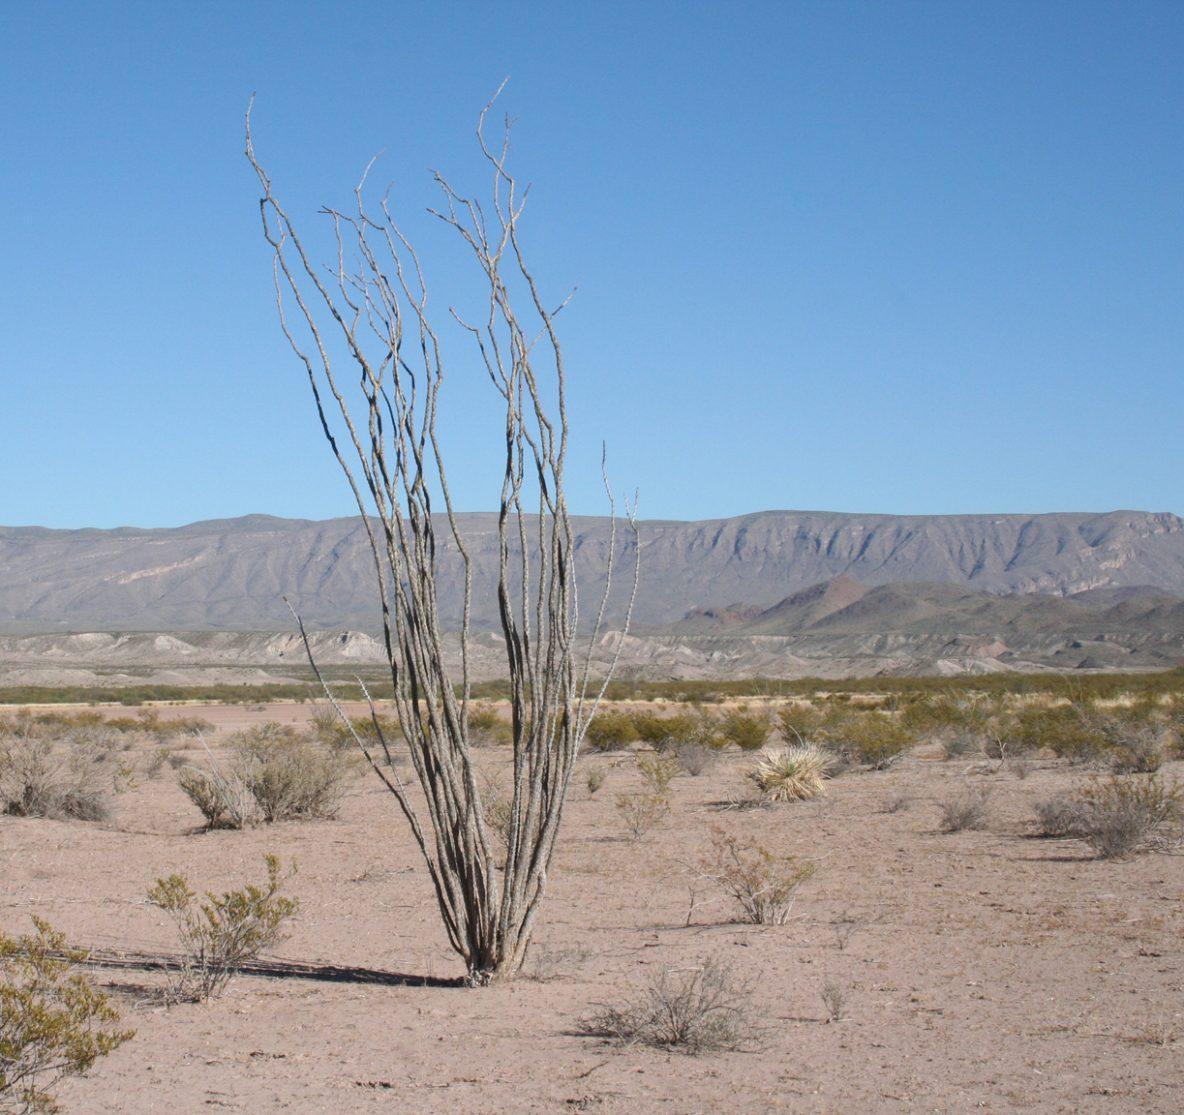 Desert scene with dried ocatillo.